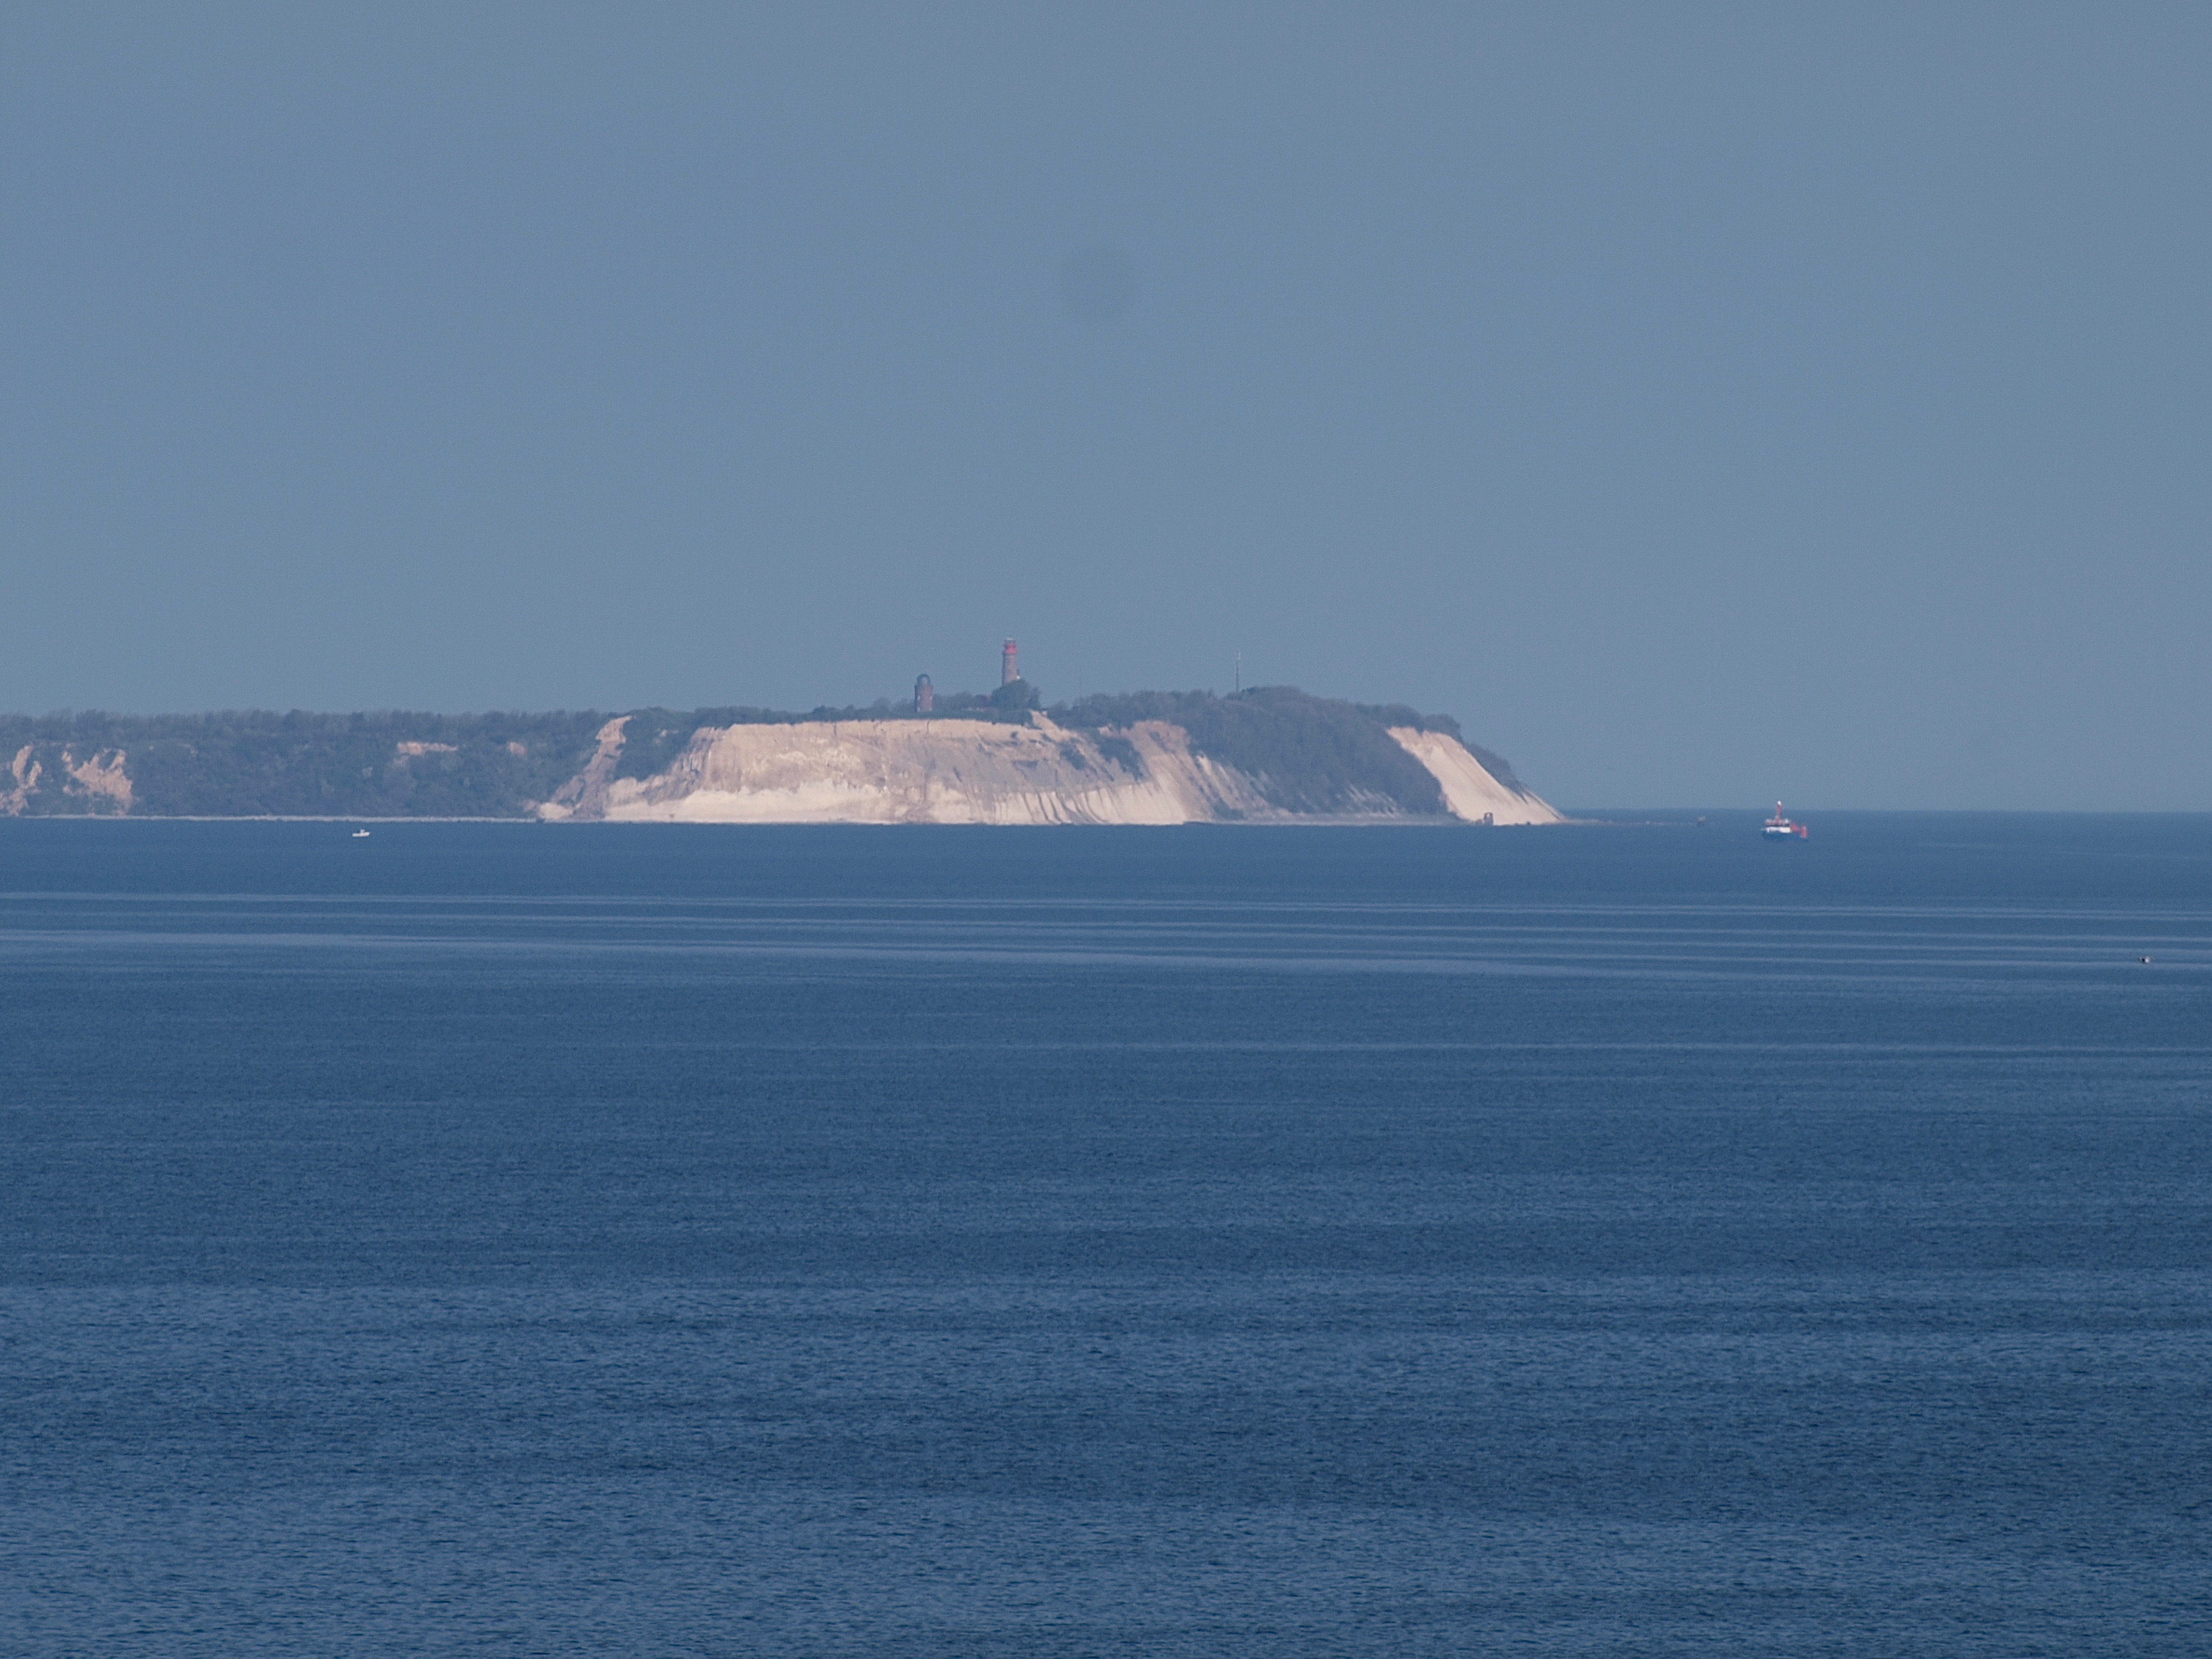 Rügen: Kap Arcona - Frühjahr 2013